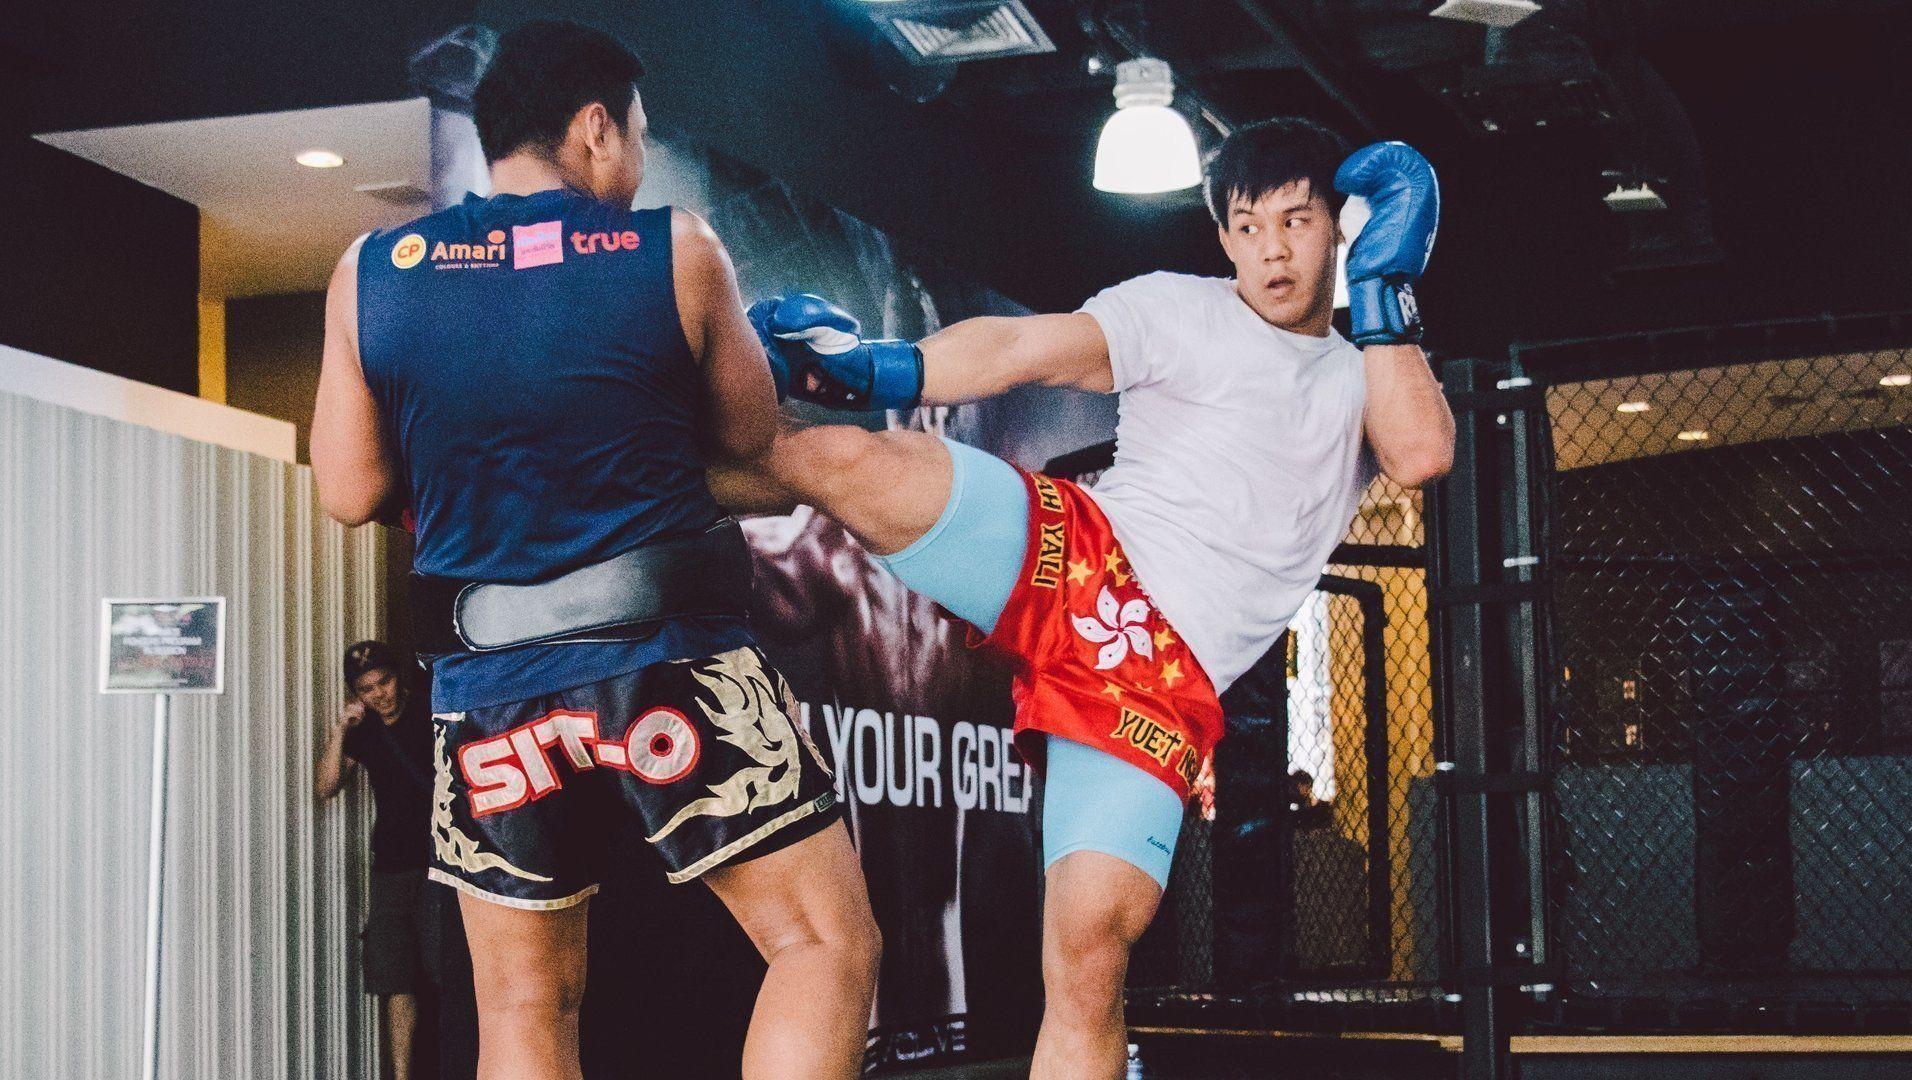 Eddie Muay Thai